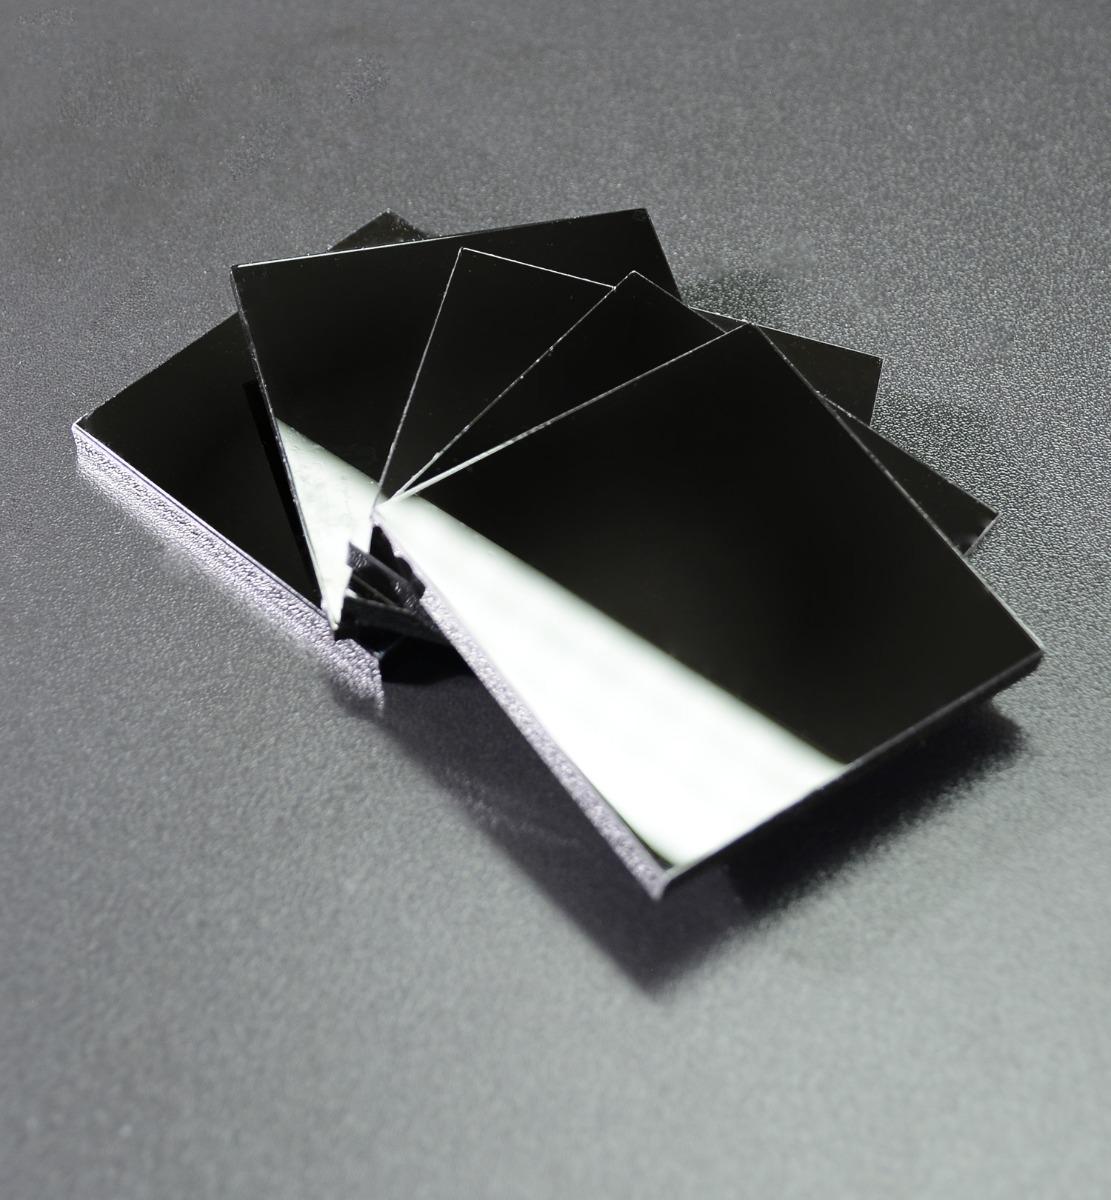 Acrylglassplatte schwarz - Hauptbild